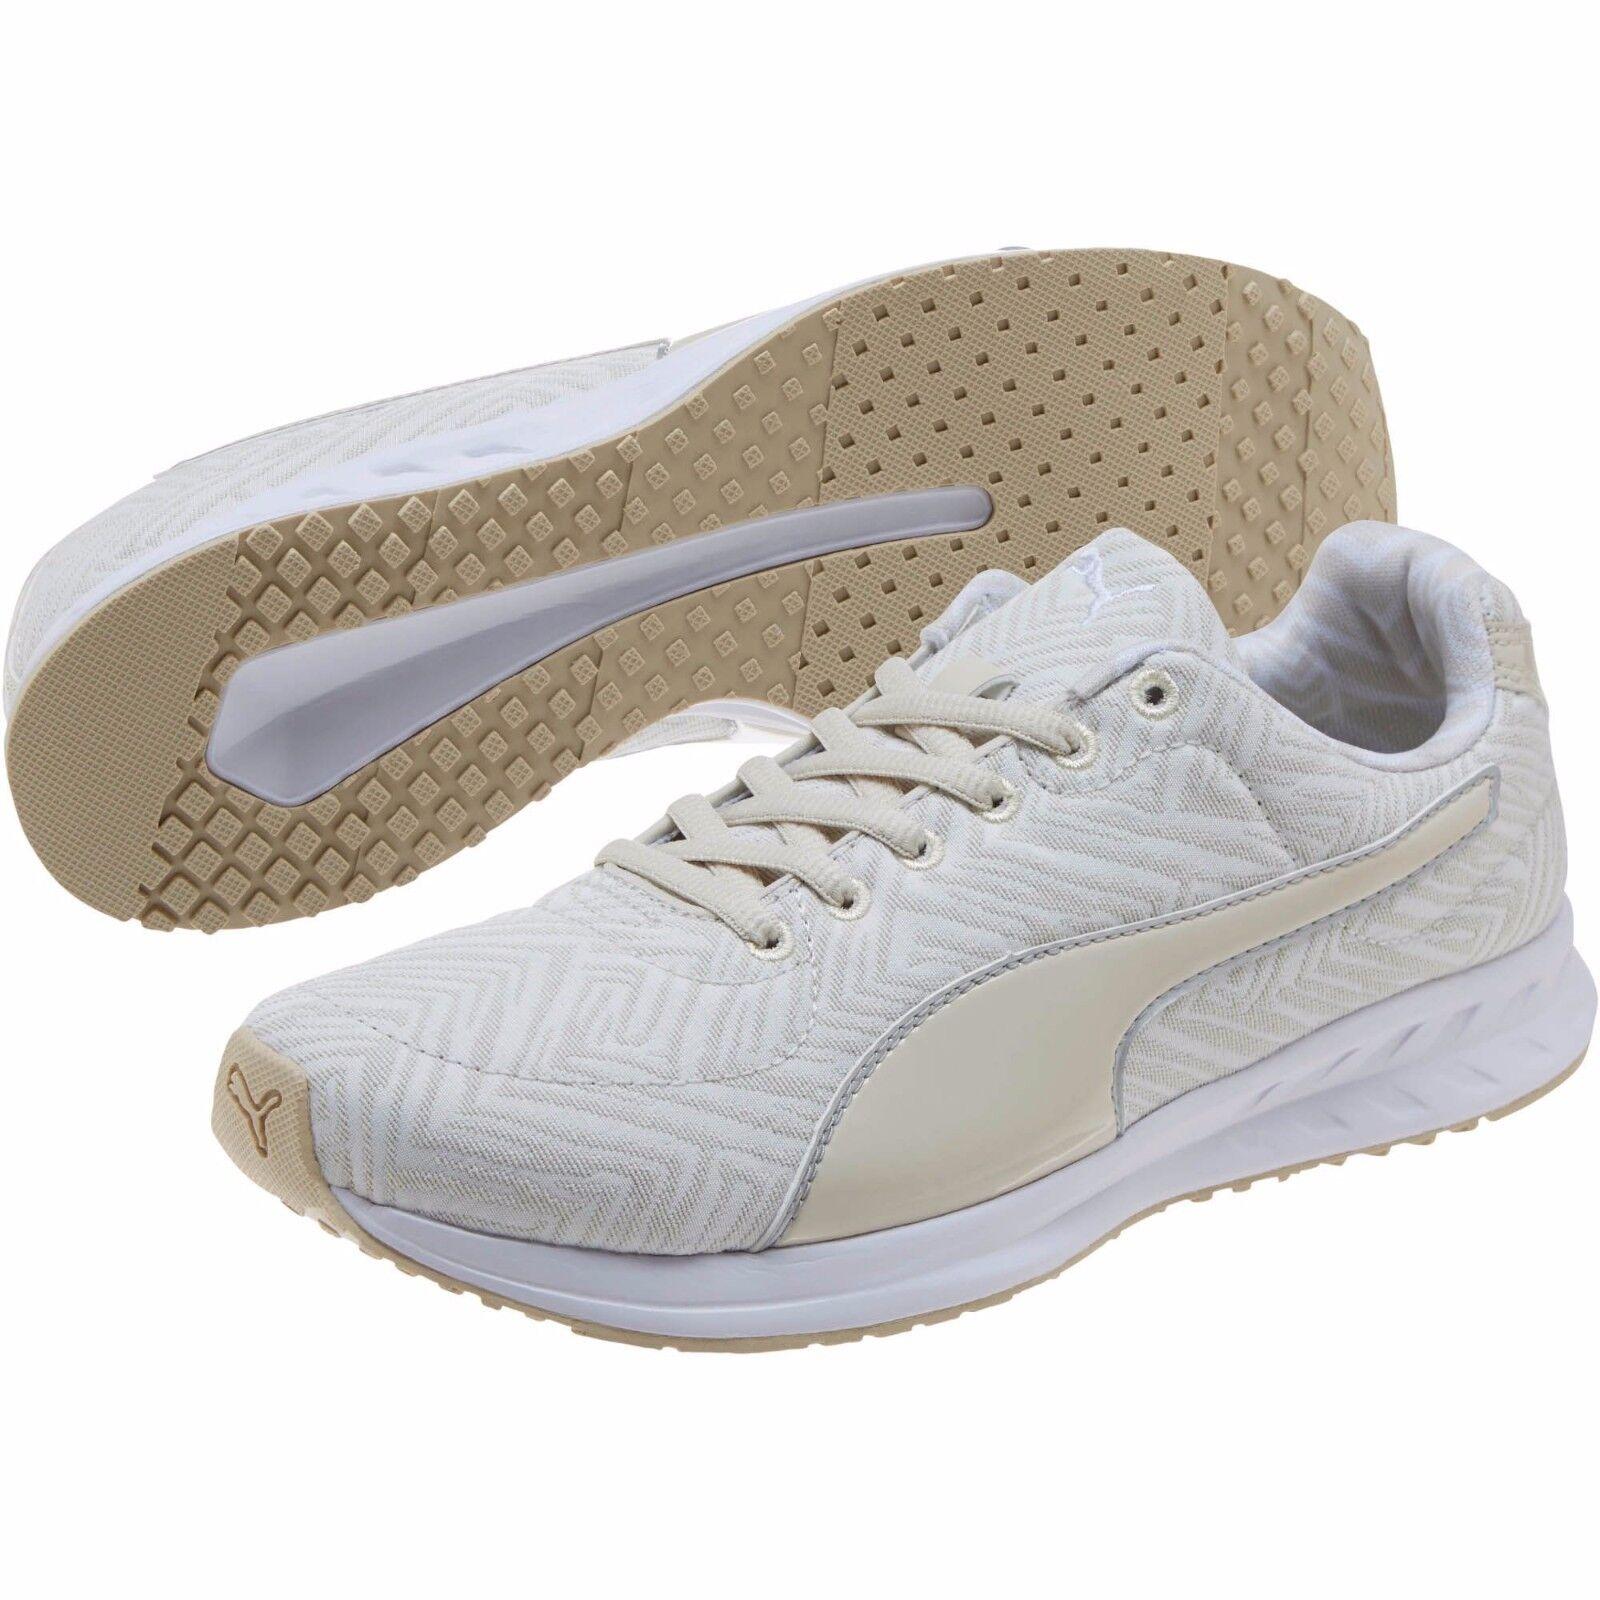 PUMA BURST CHEVRON WOMEN'S Schuhe, RUNNING Schuhe, WOMEN'S #19015803 960853